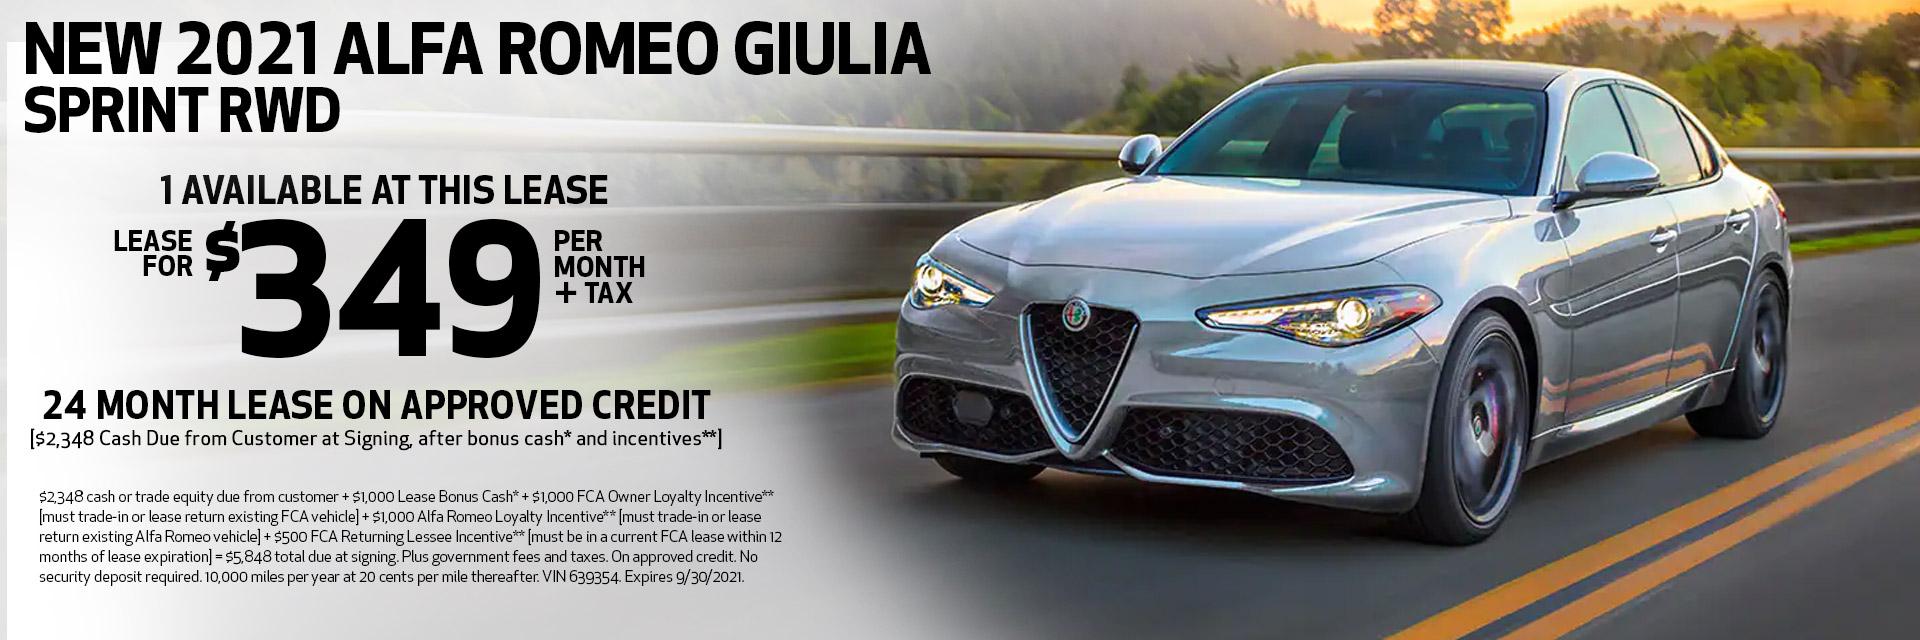 New 2021 Alfa Romeo Giulia Spring RWD